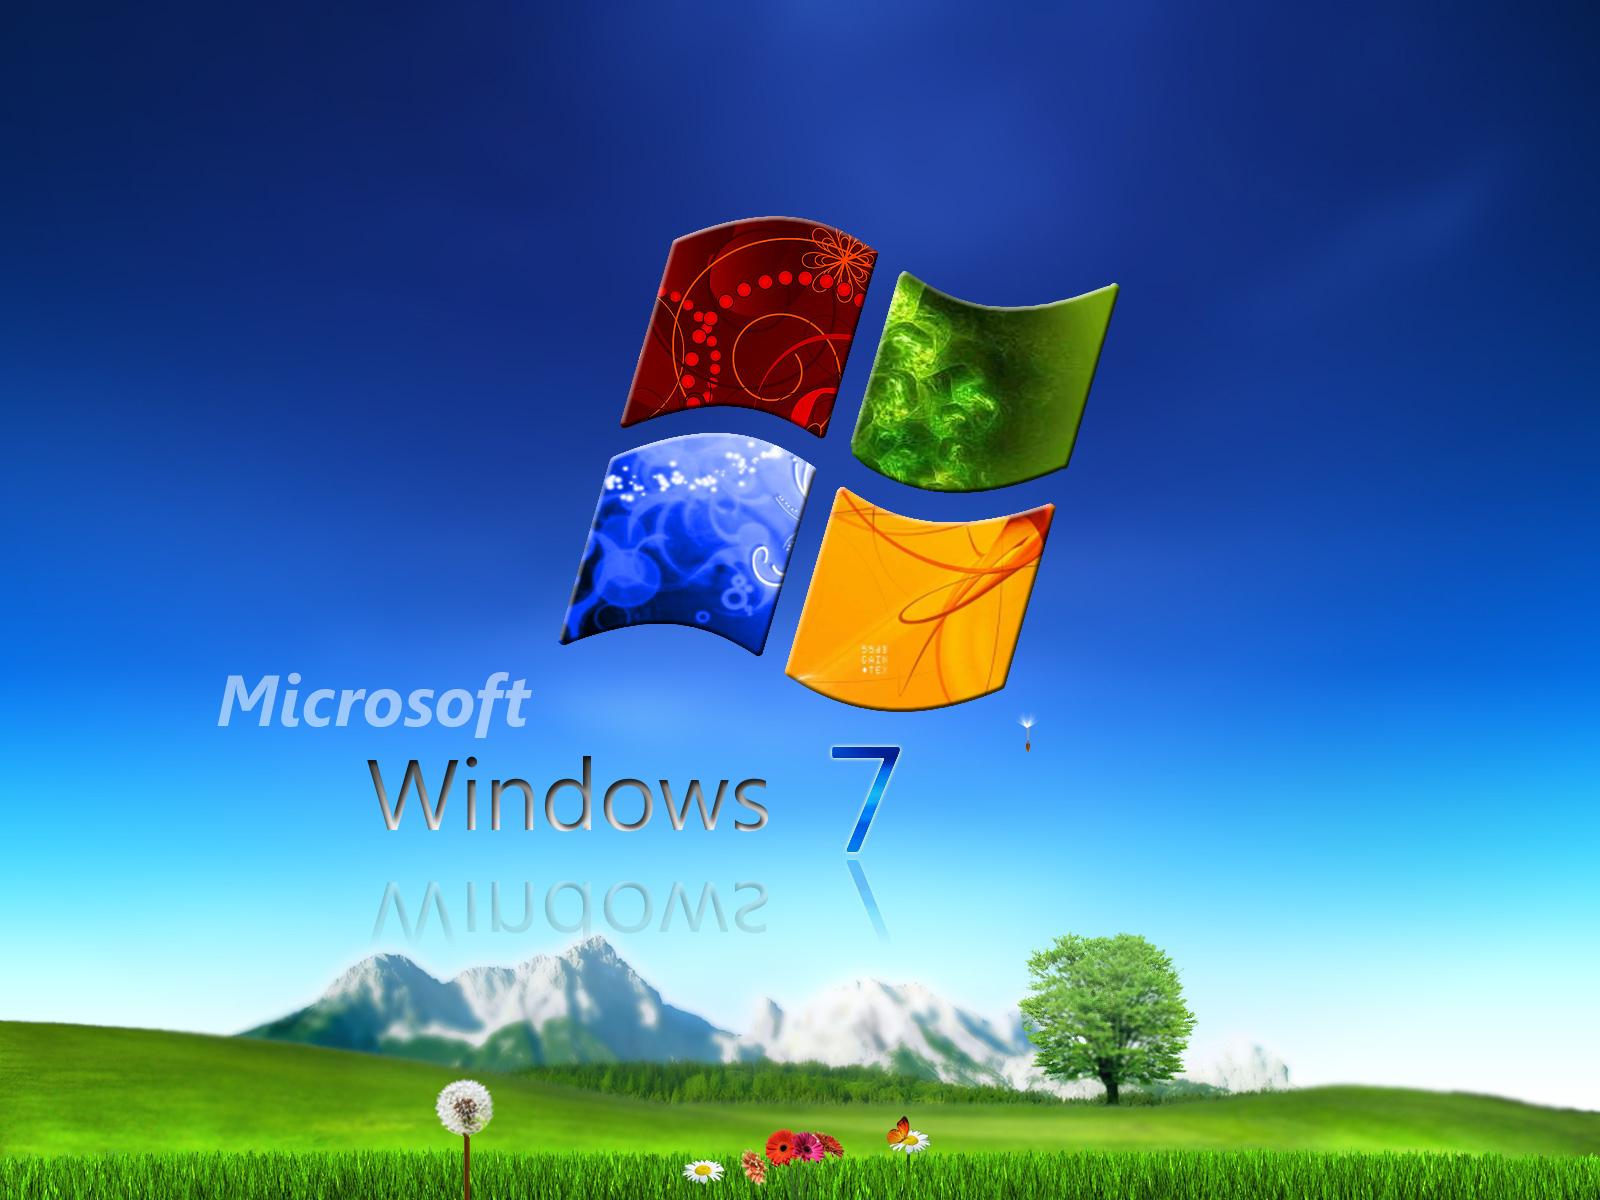 http://3.bp.blogspot.com/-vbMSxBwicDw/T-ndMLPleDI/AAAAAAAABqw/xWhAn8QiCTA/s1600/Windows%2B7%2BWallpapers1.jpg